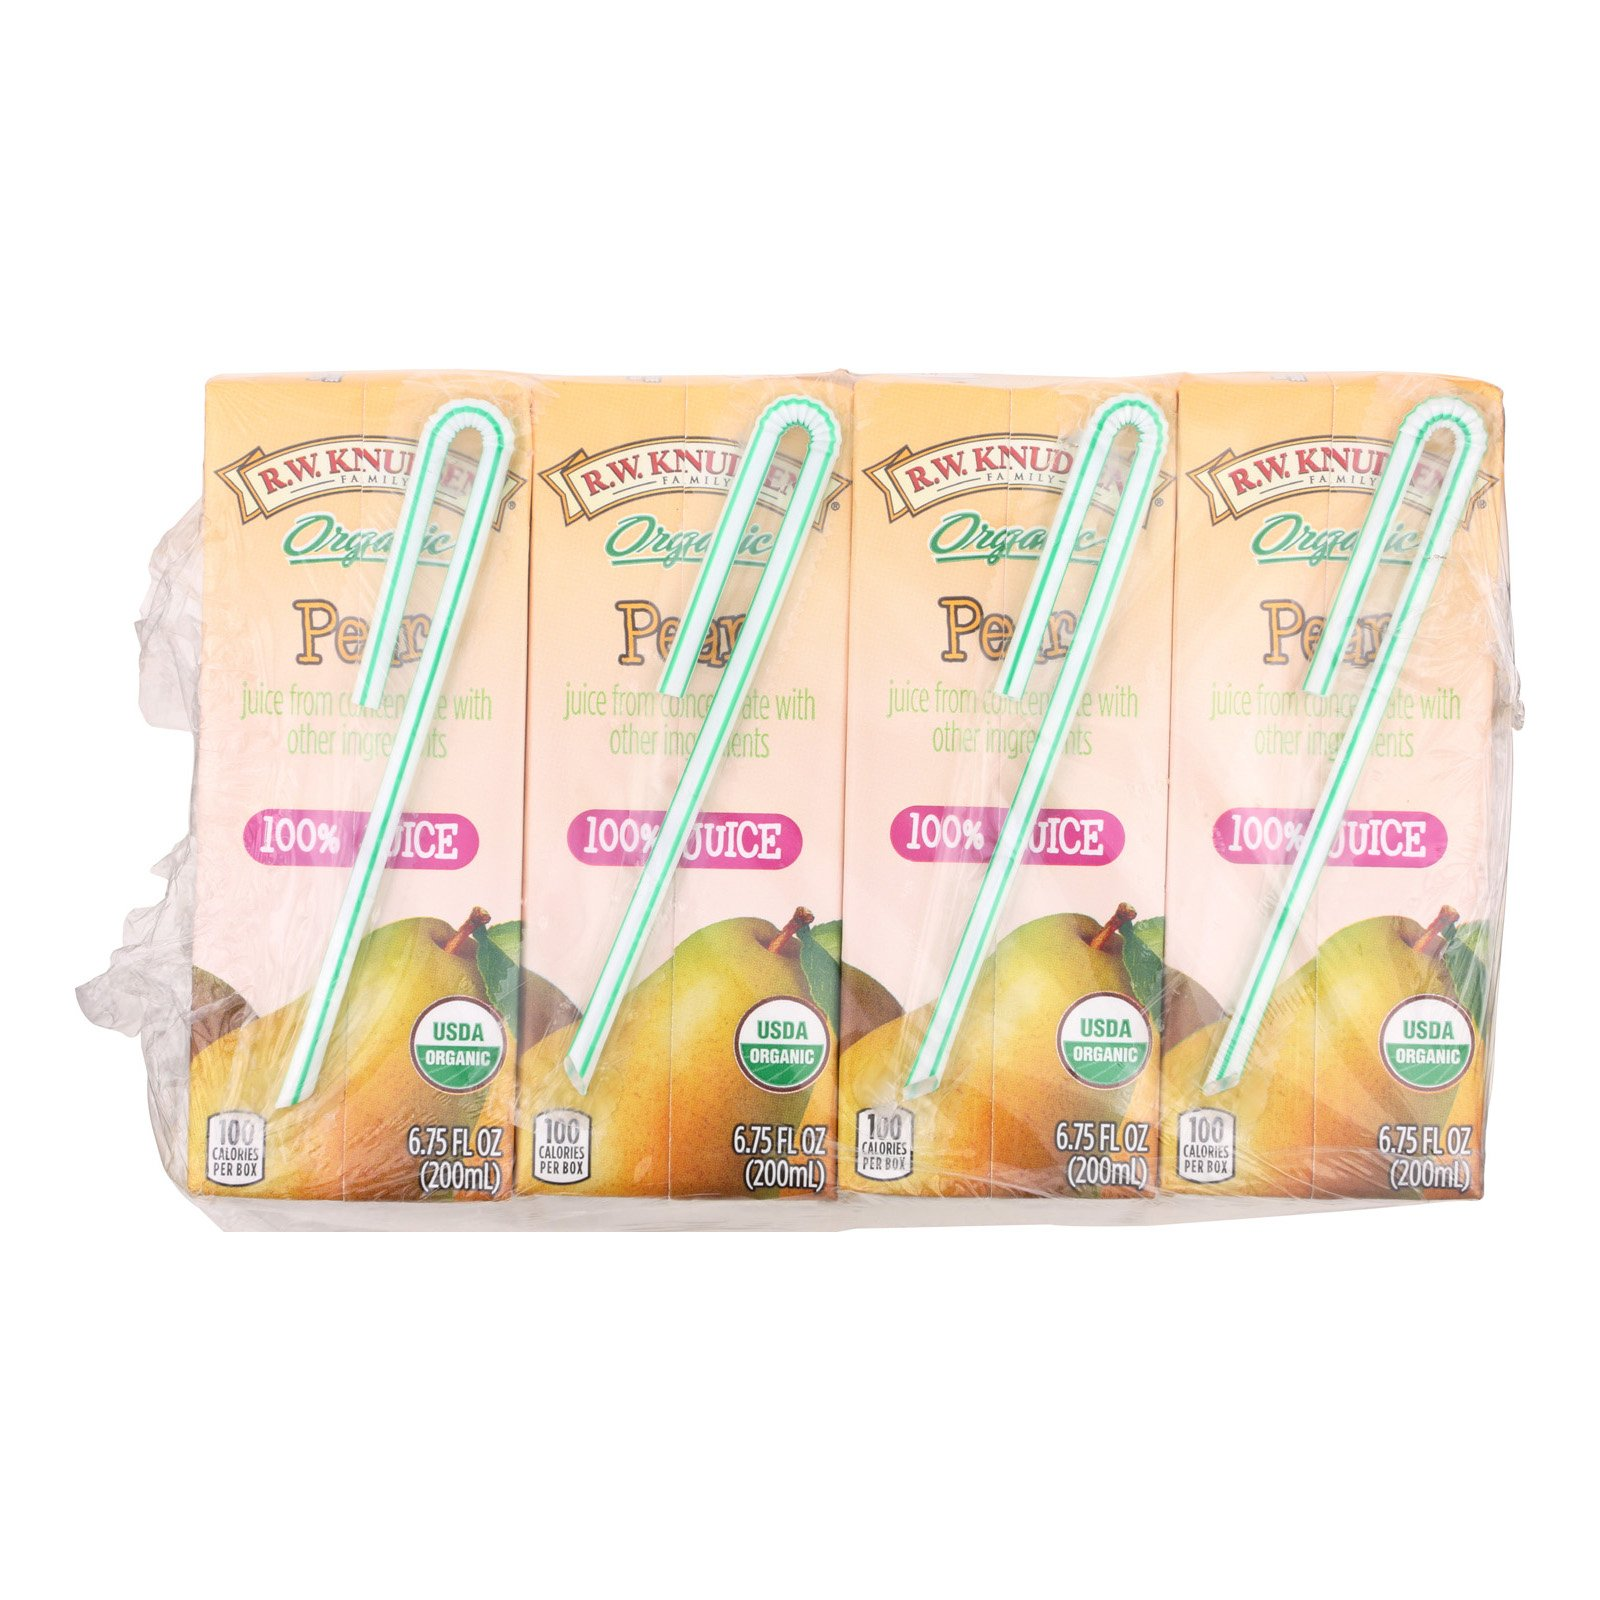 R.W. Knudsen Organic Juice - Pear - Case of 7 - 6.75 Fl oz.